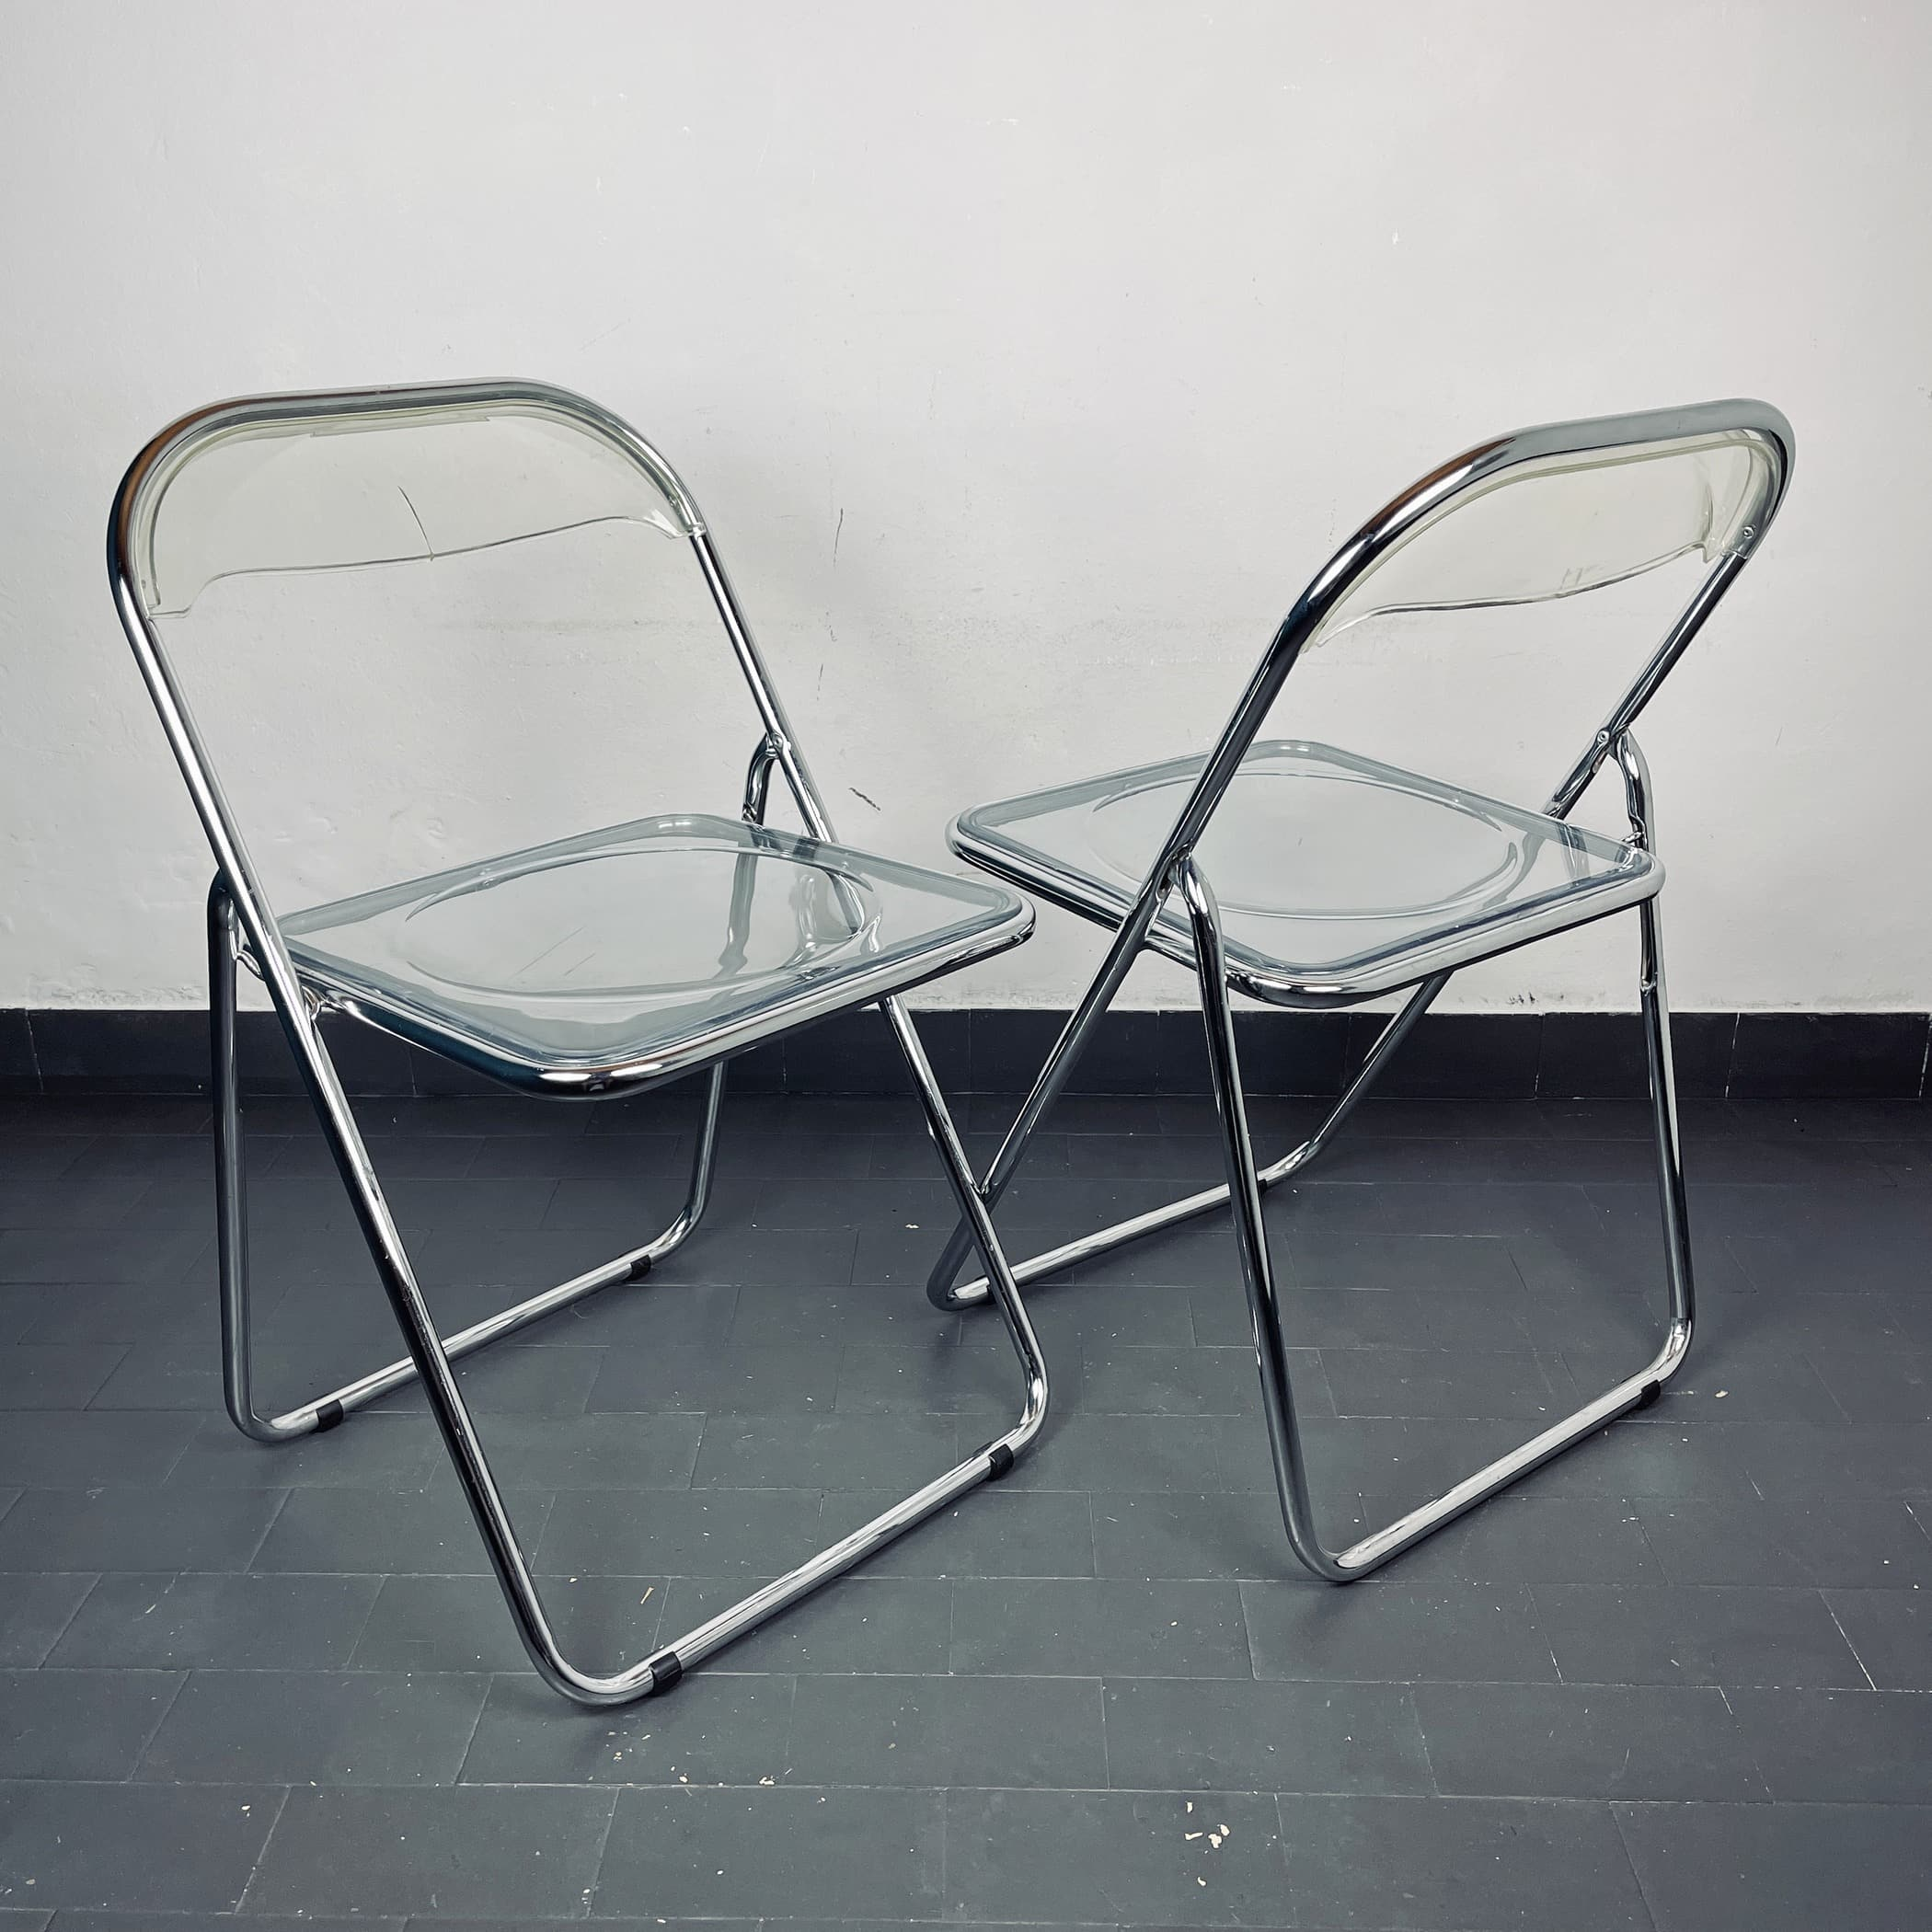 Pair of mid-century folding chairs Italy 1980s Italian modern Plia Design style Piretti Desk Chair diner chair